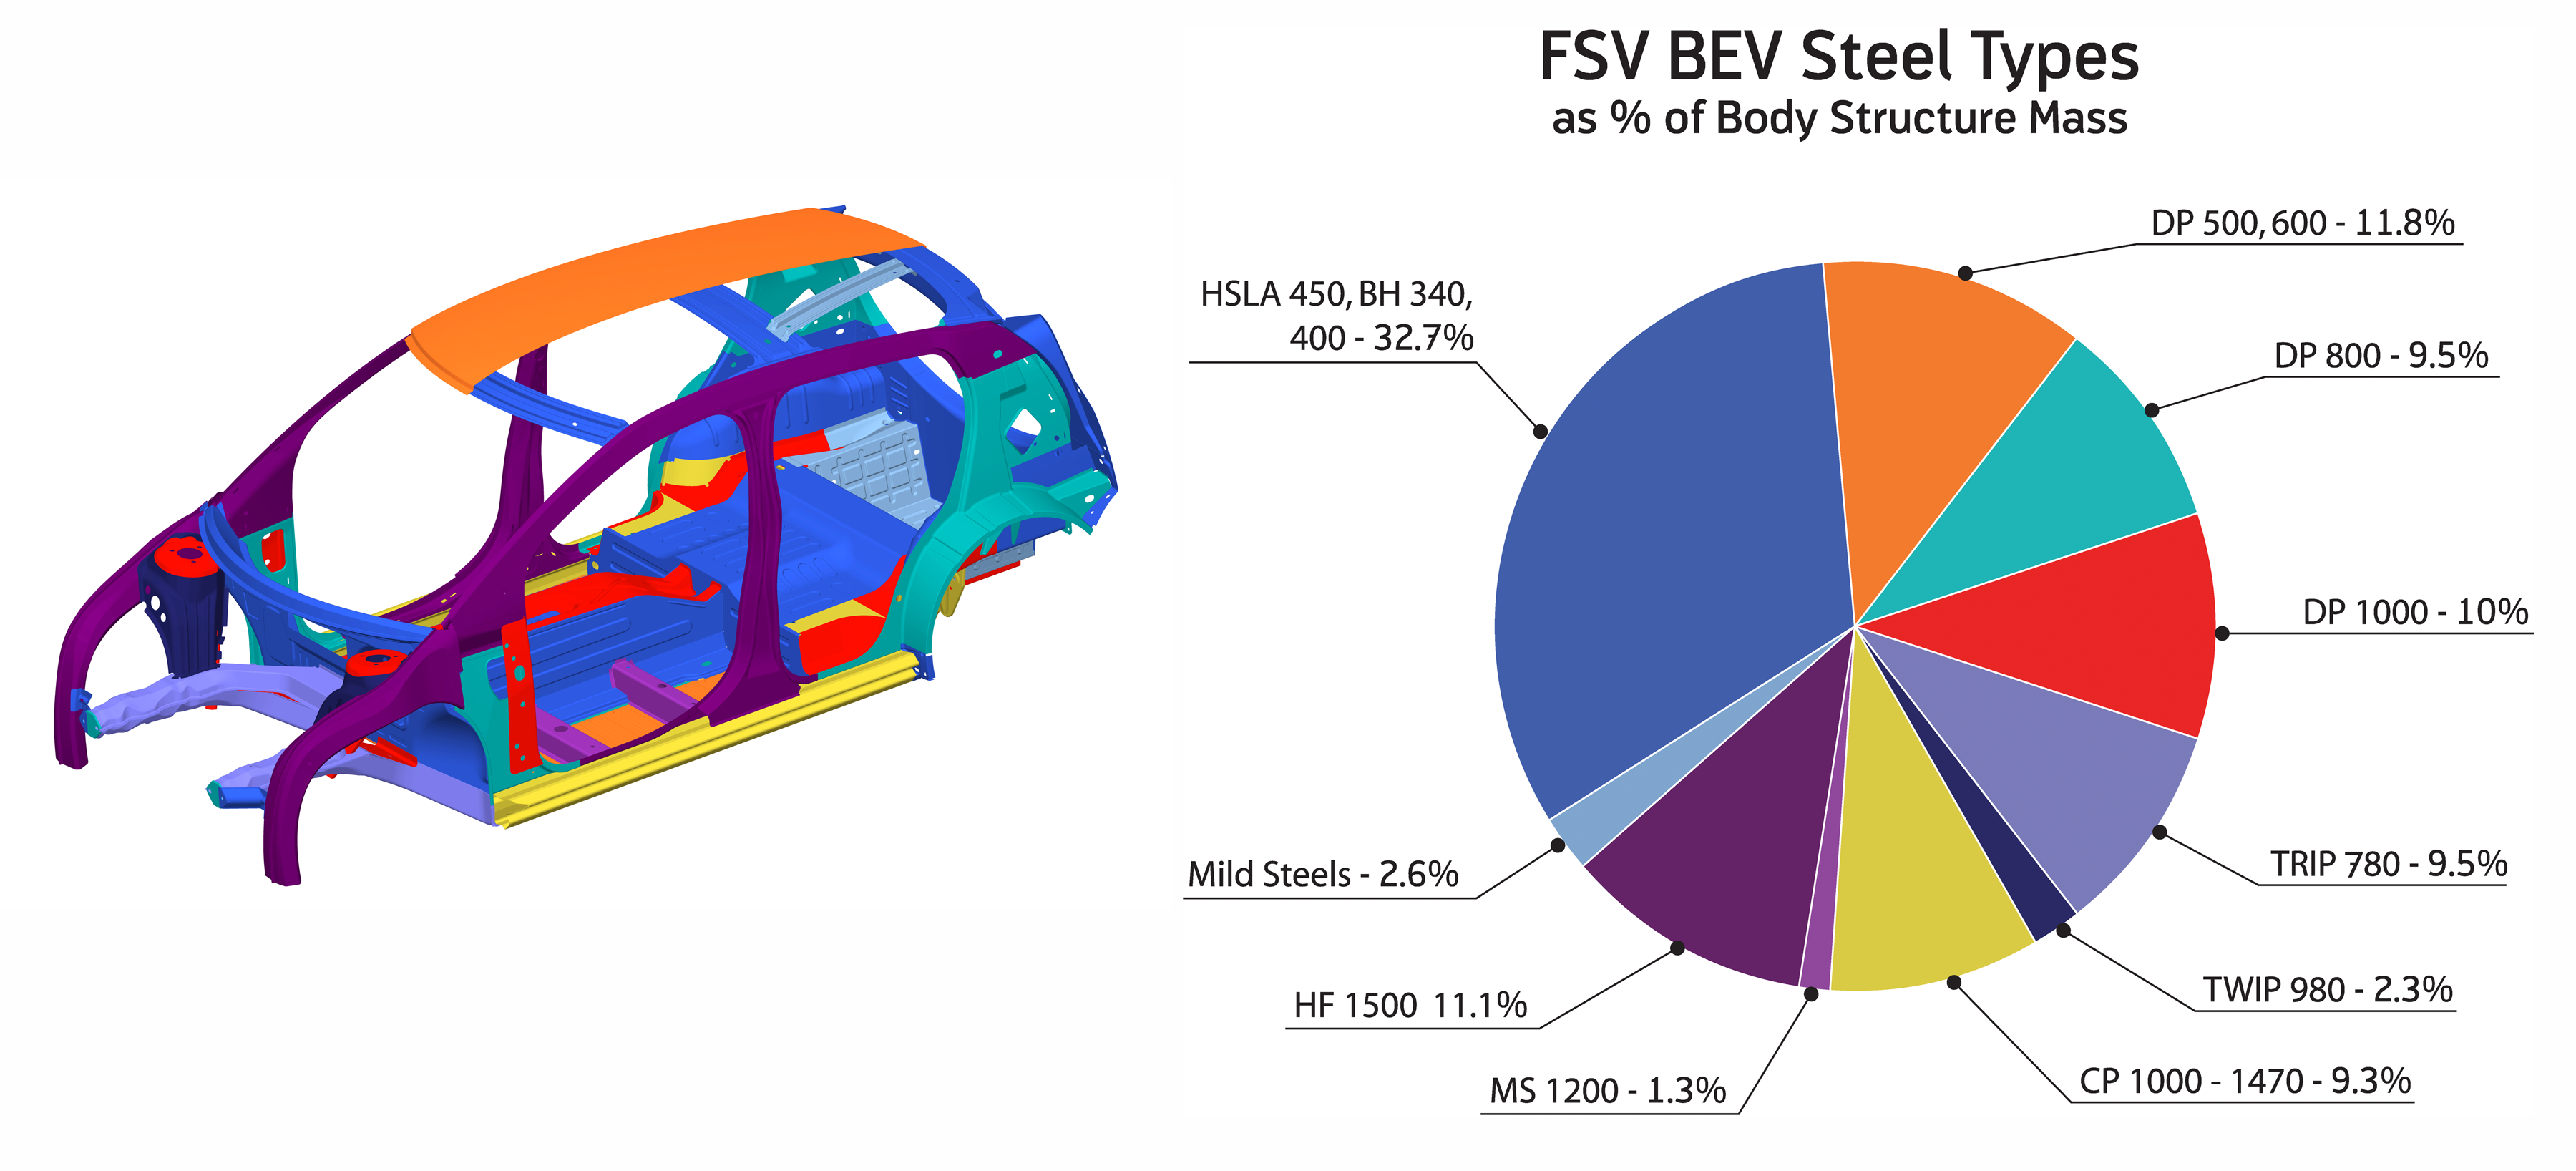 Lightweighting Lies Heavy On Automotive Industry